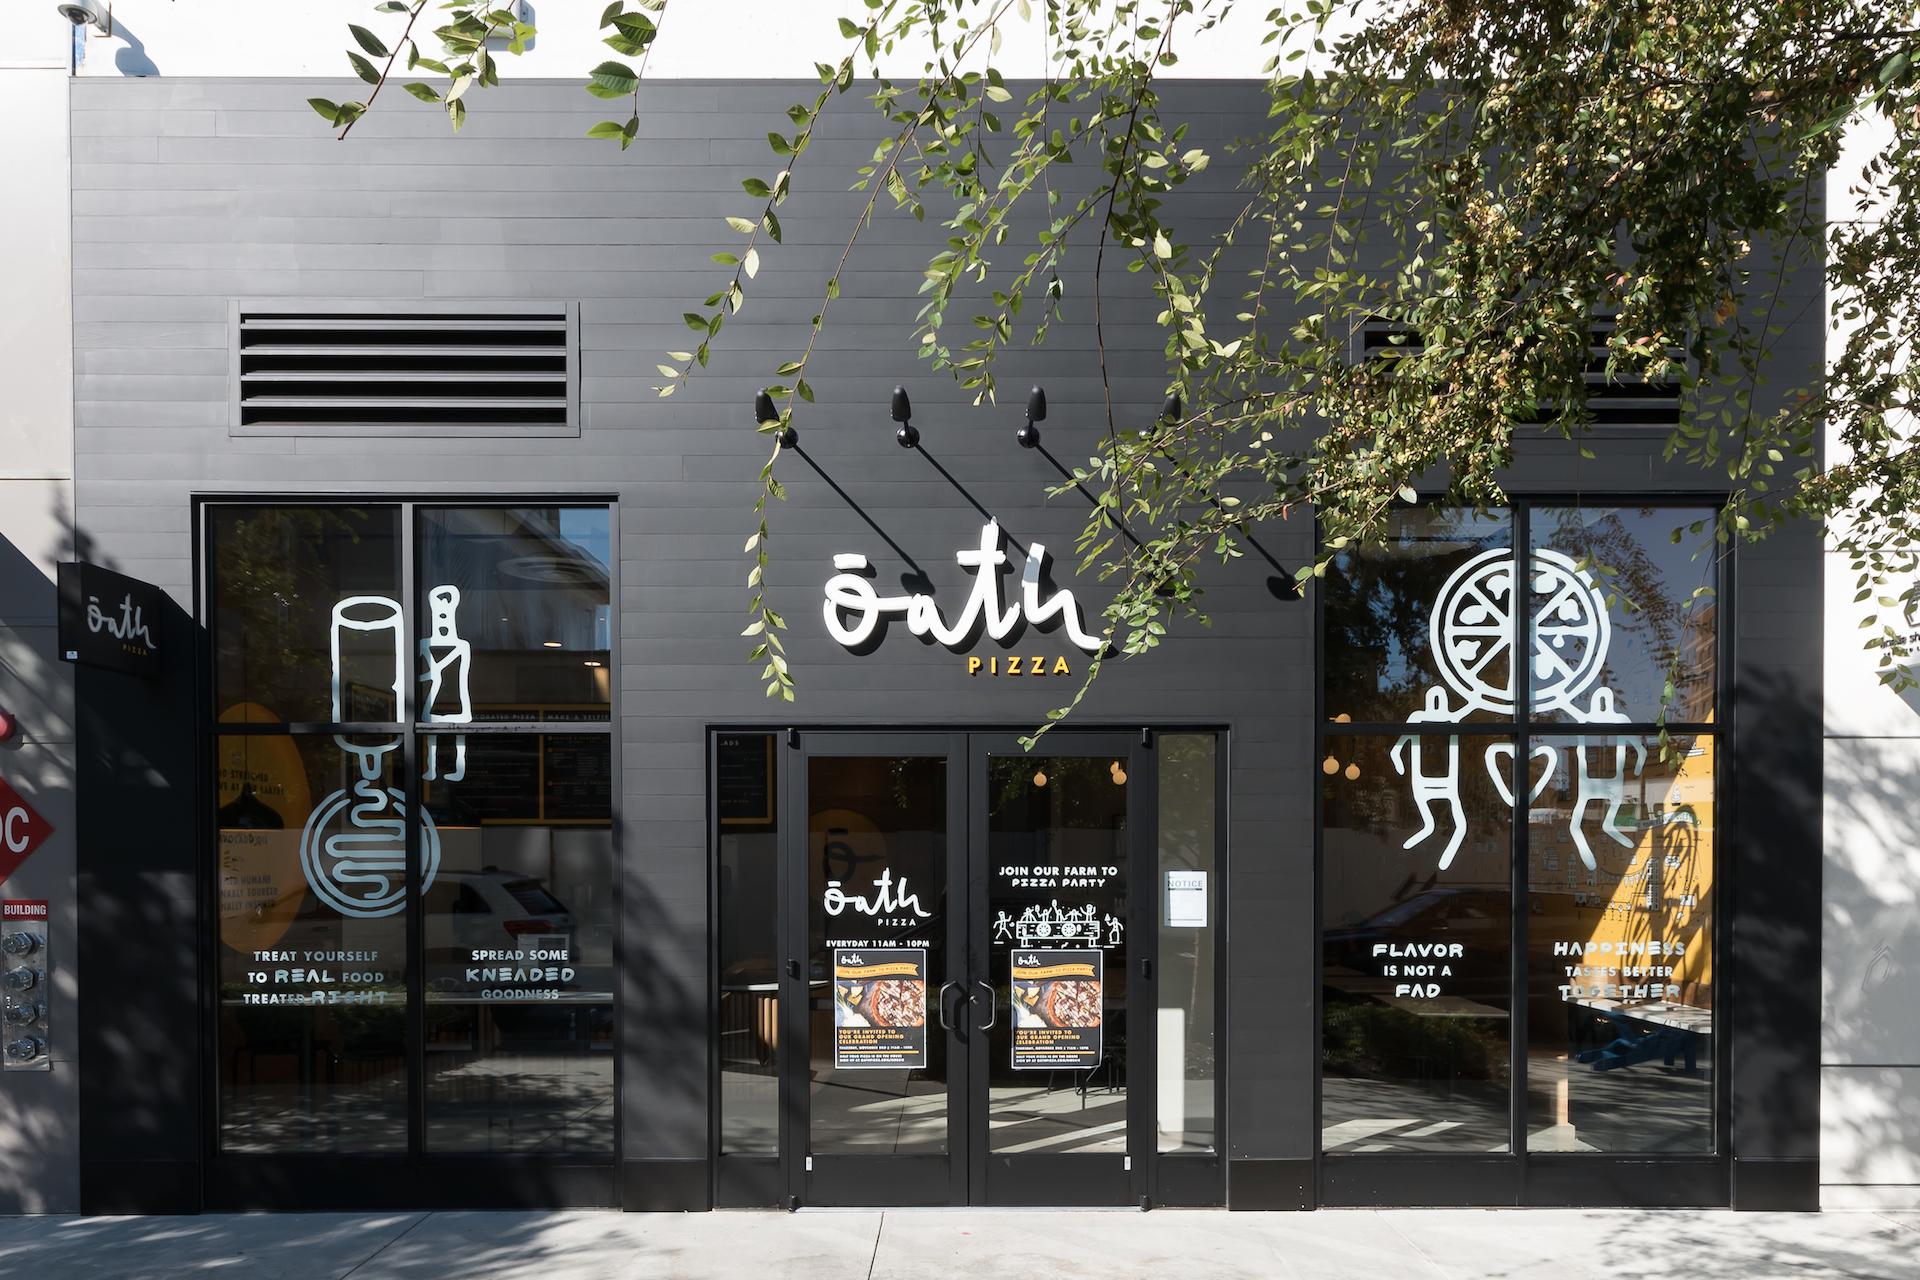 Oath Pizza-Fairfax VA-facade sm.jpg